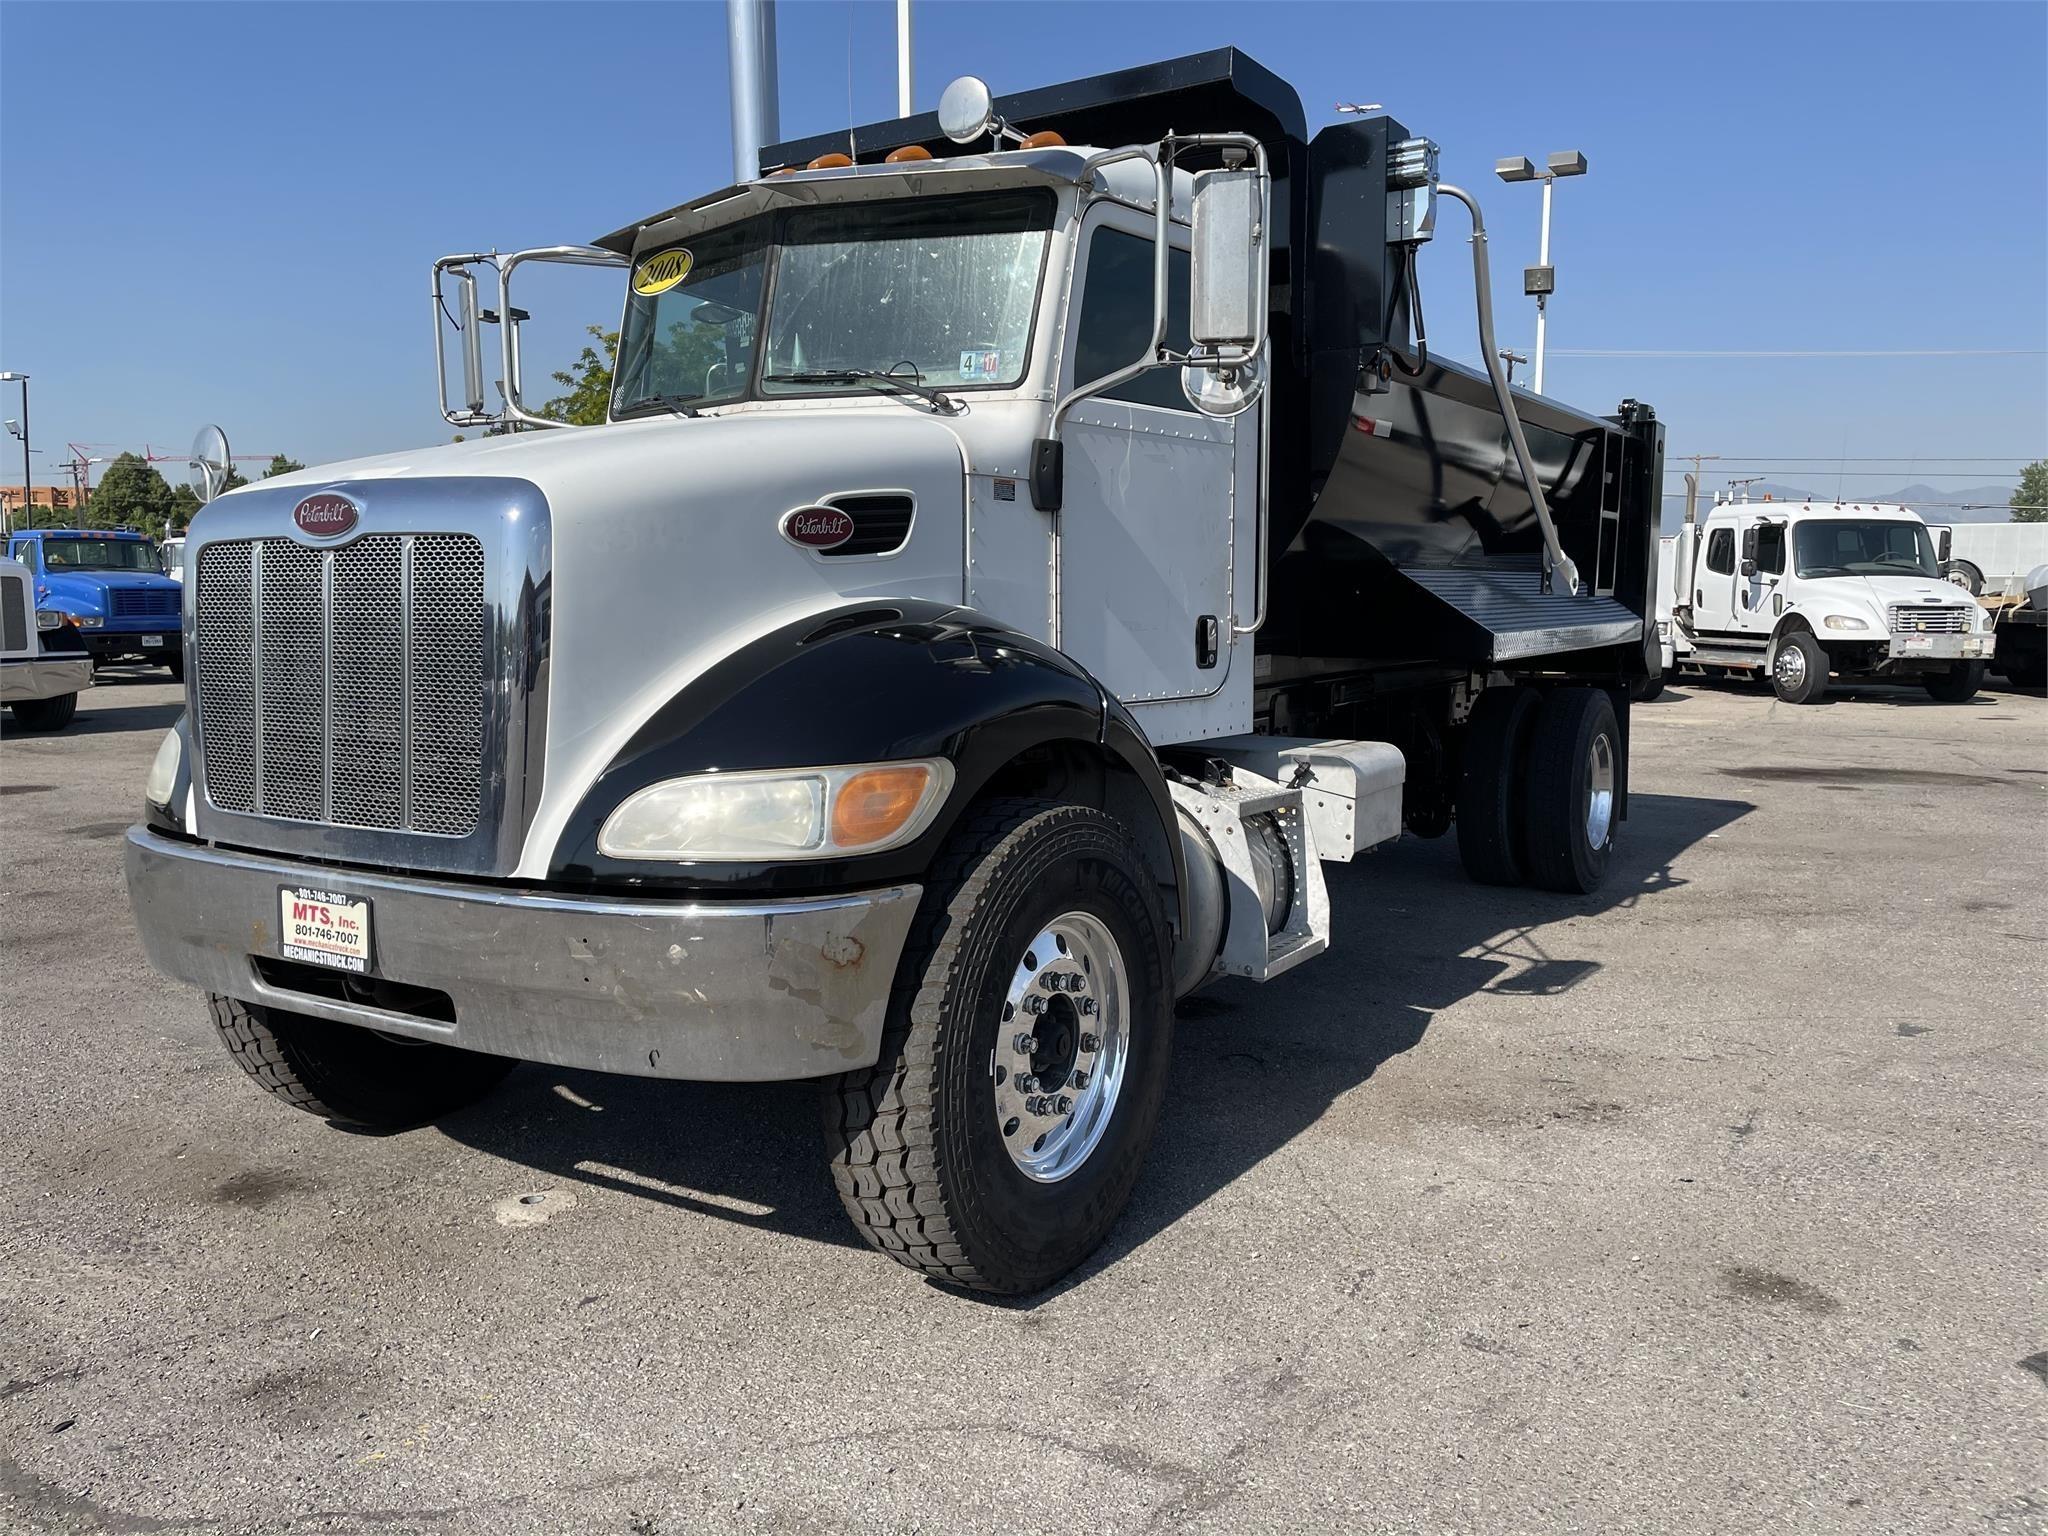 Used, 2008, PETERBILT, 335, Dump Truck